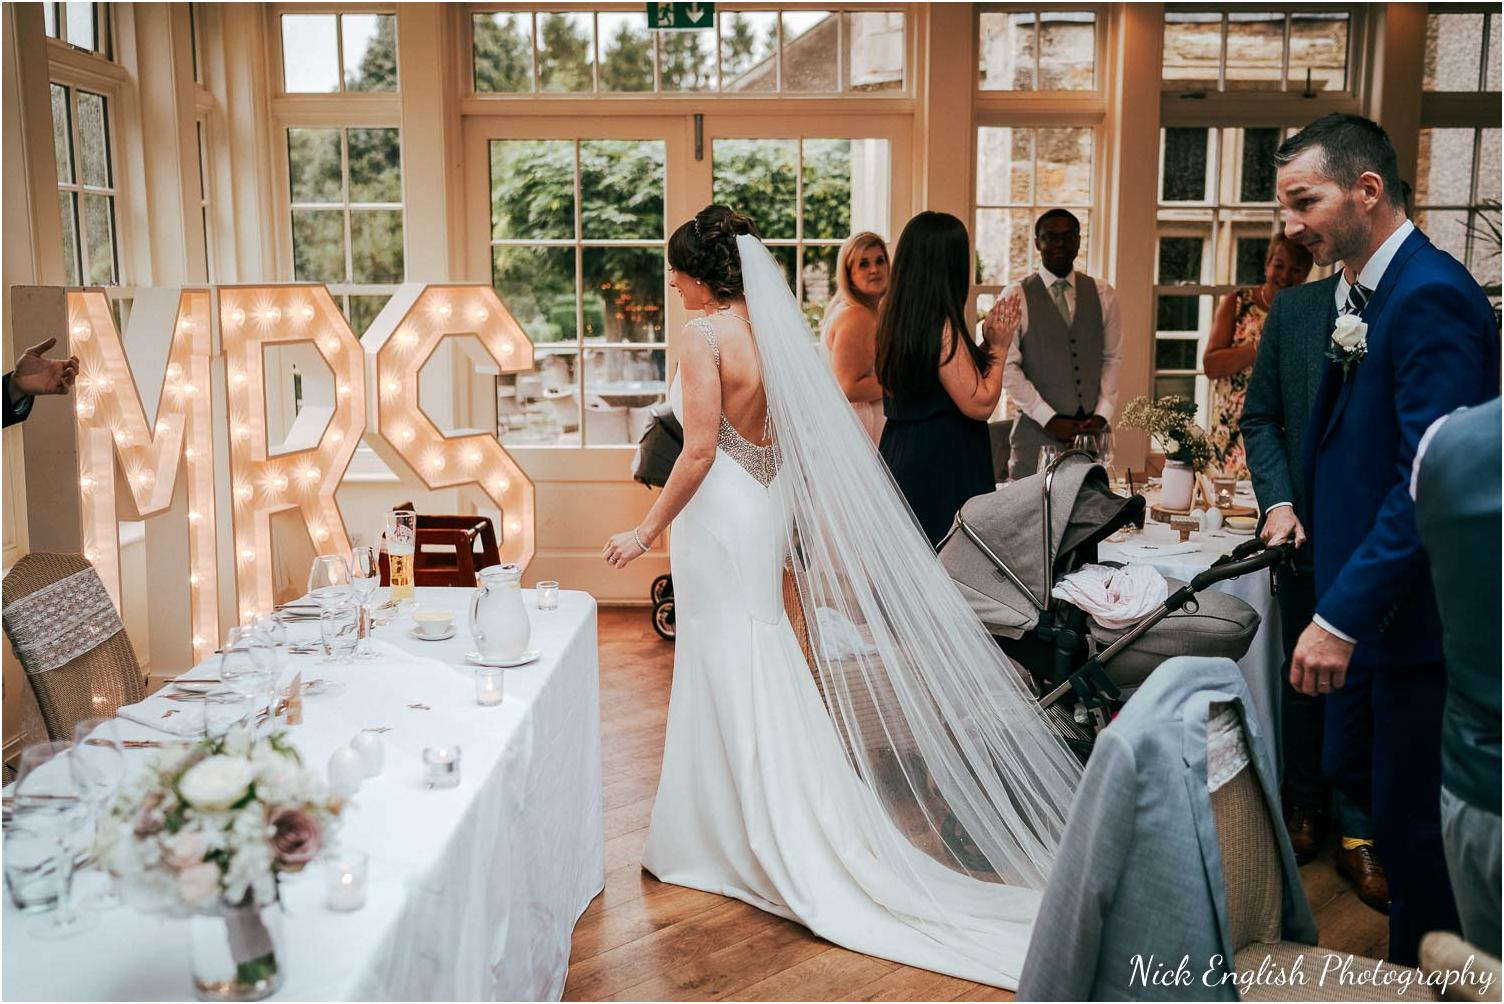 Mitton_Hall_Wedding_Summer_Photograph-96.jpg